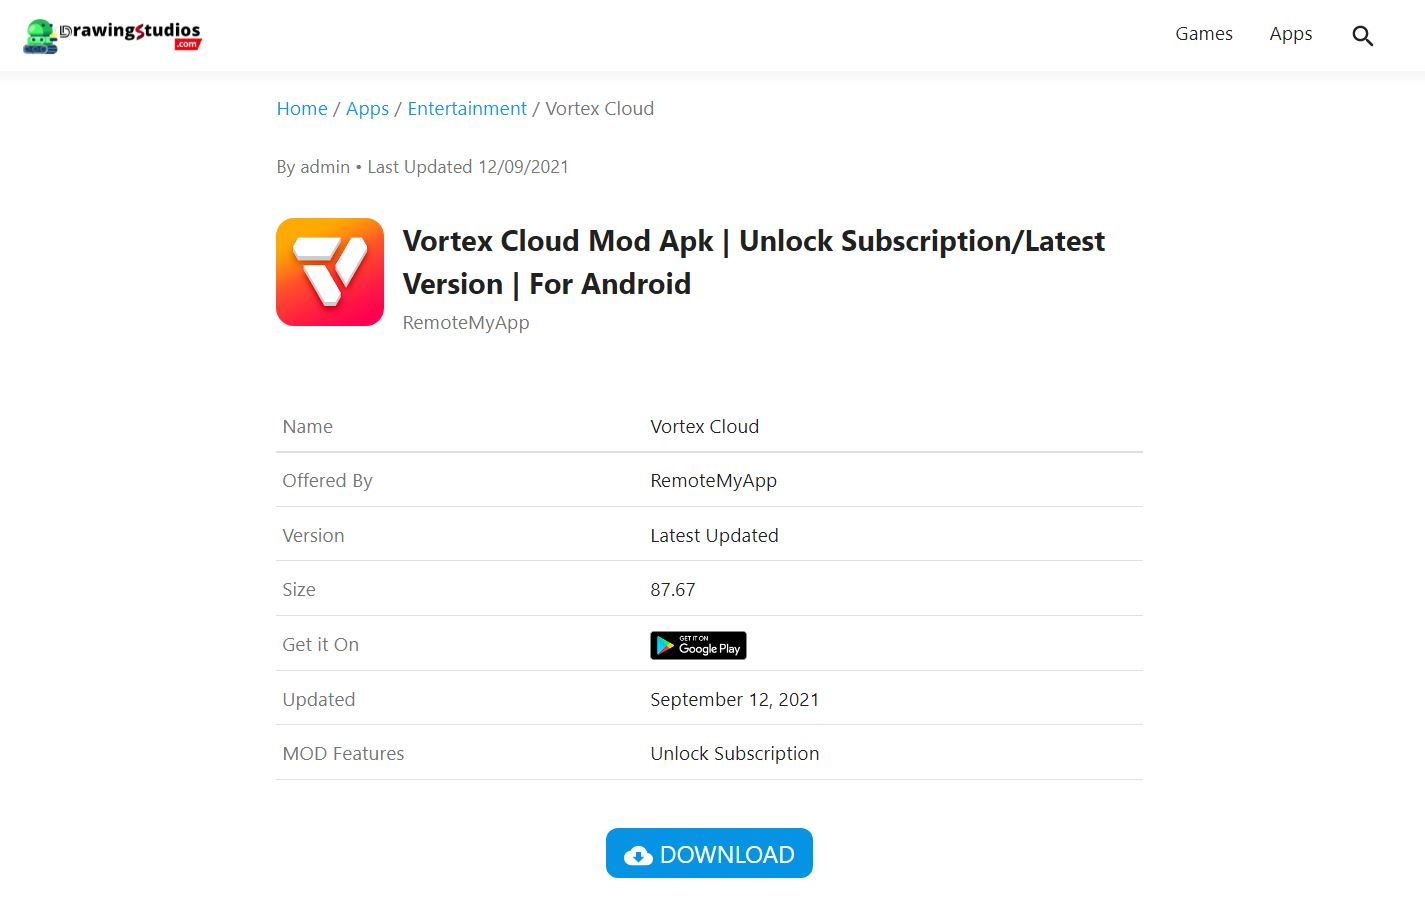 Download Vortex Cloud Mod Apk